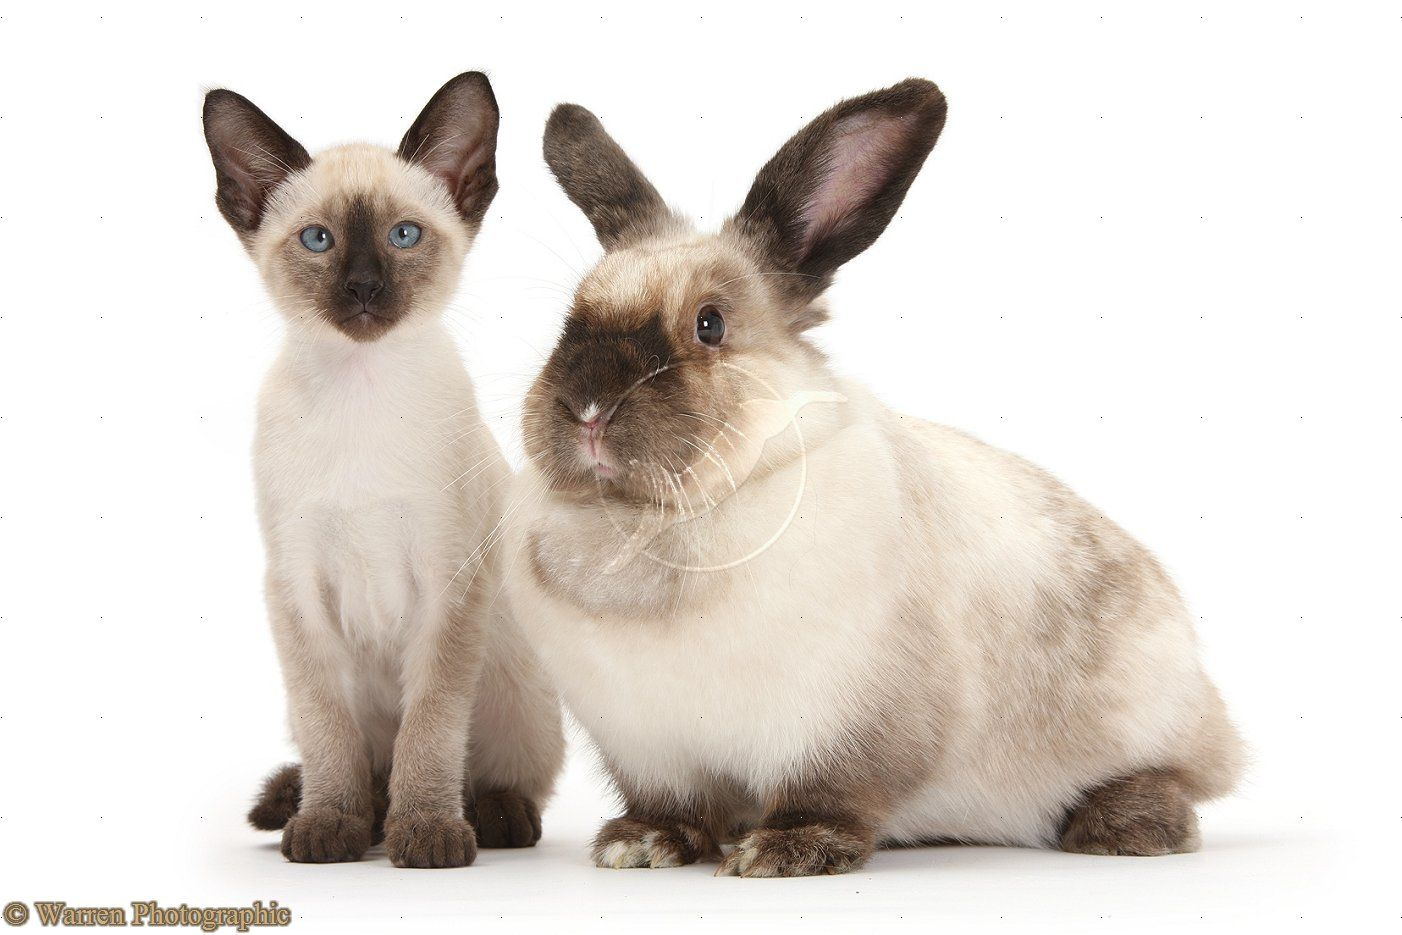 Colourpoint Rabbit And Siamese Kitten 10 Weeks Old Siamese Kittens Cat Behavior Cute Animals